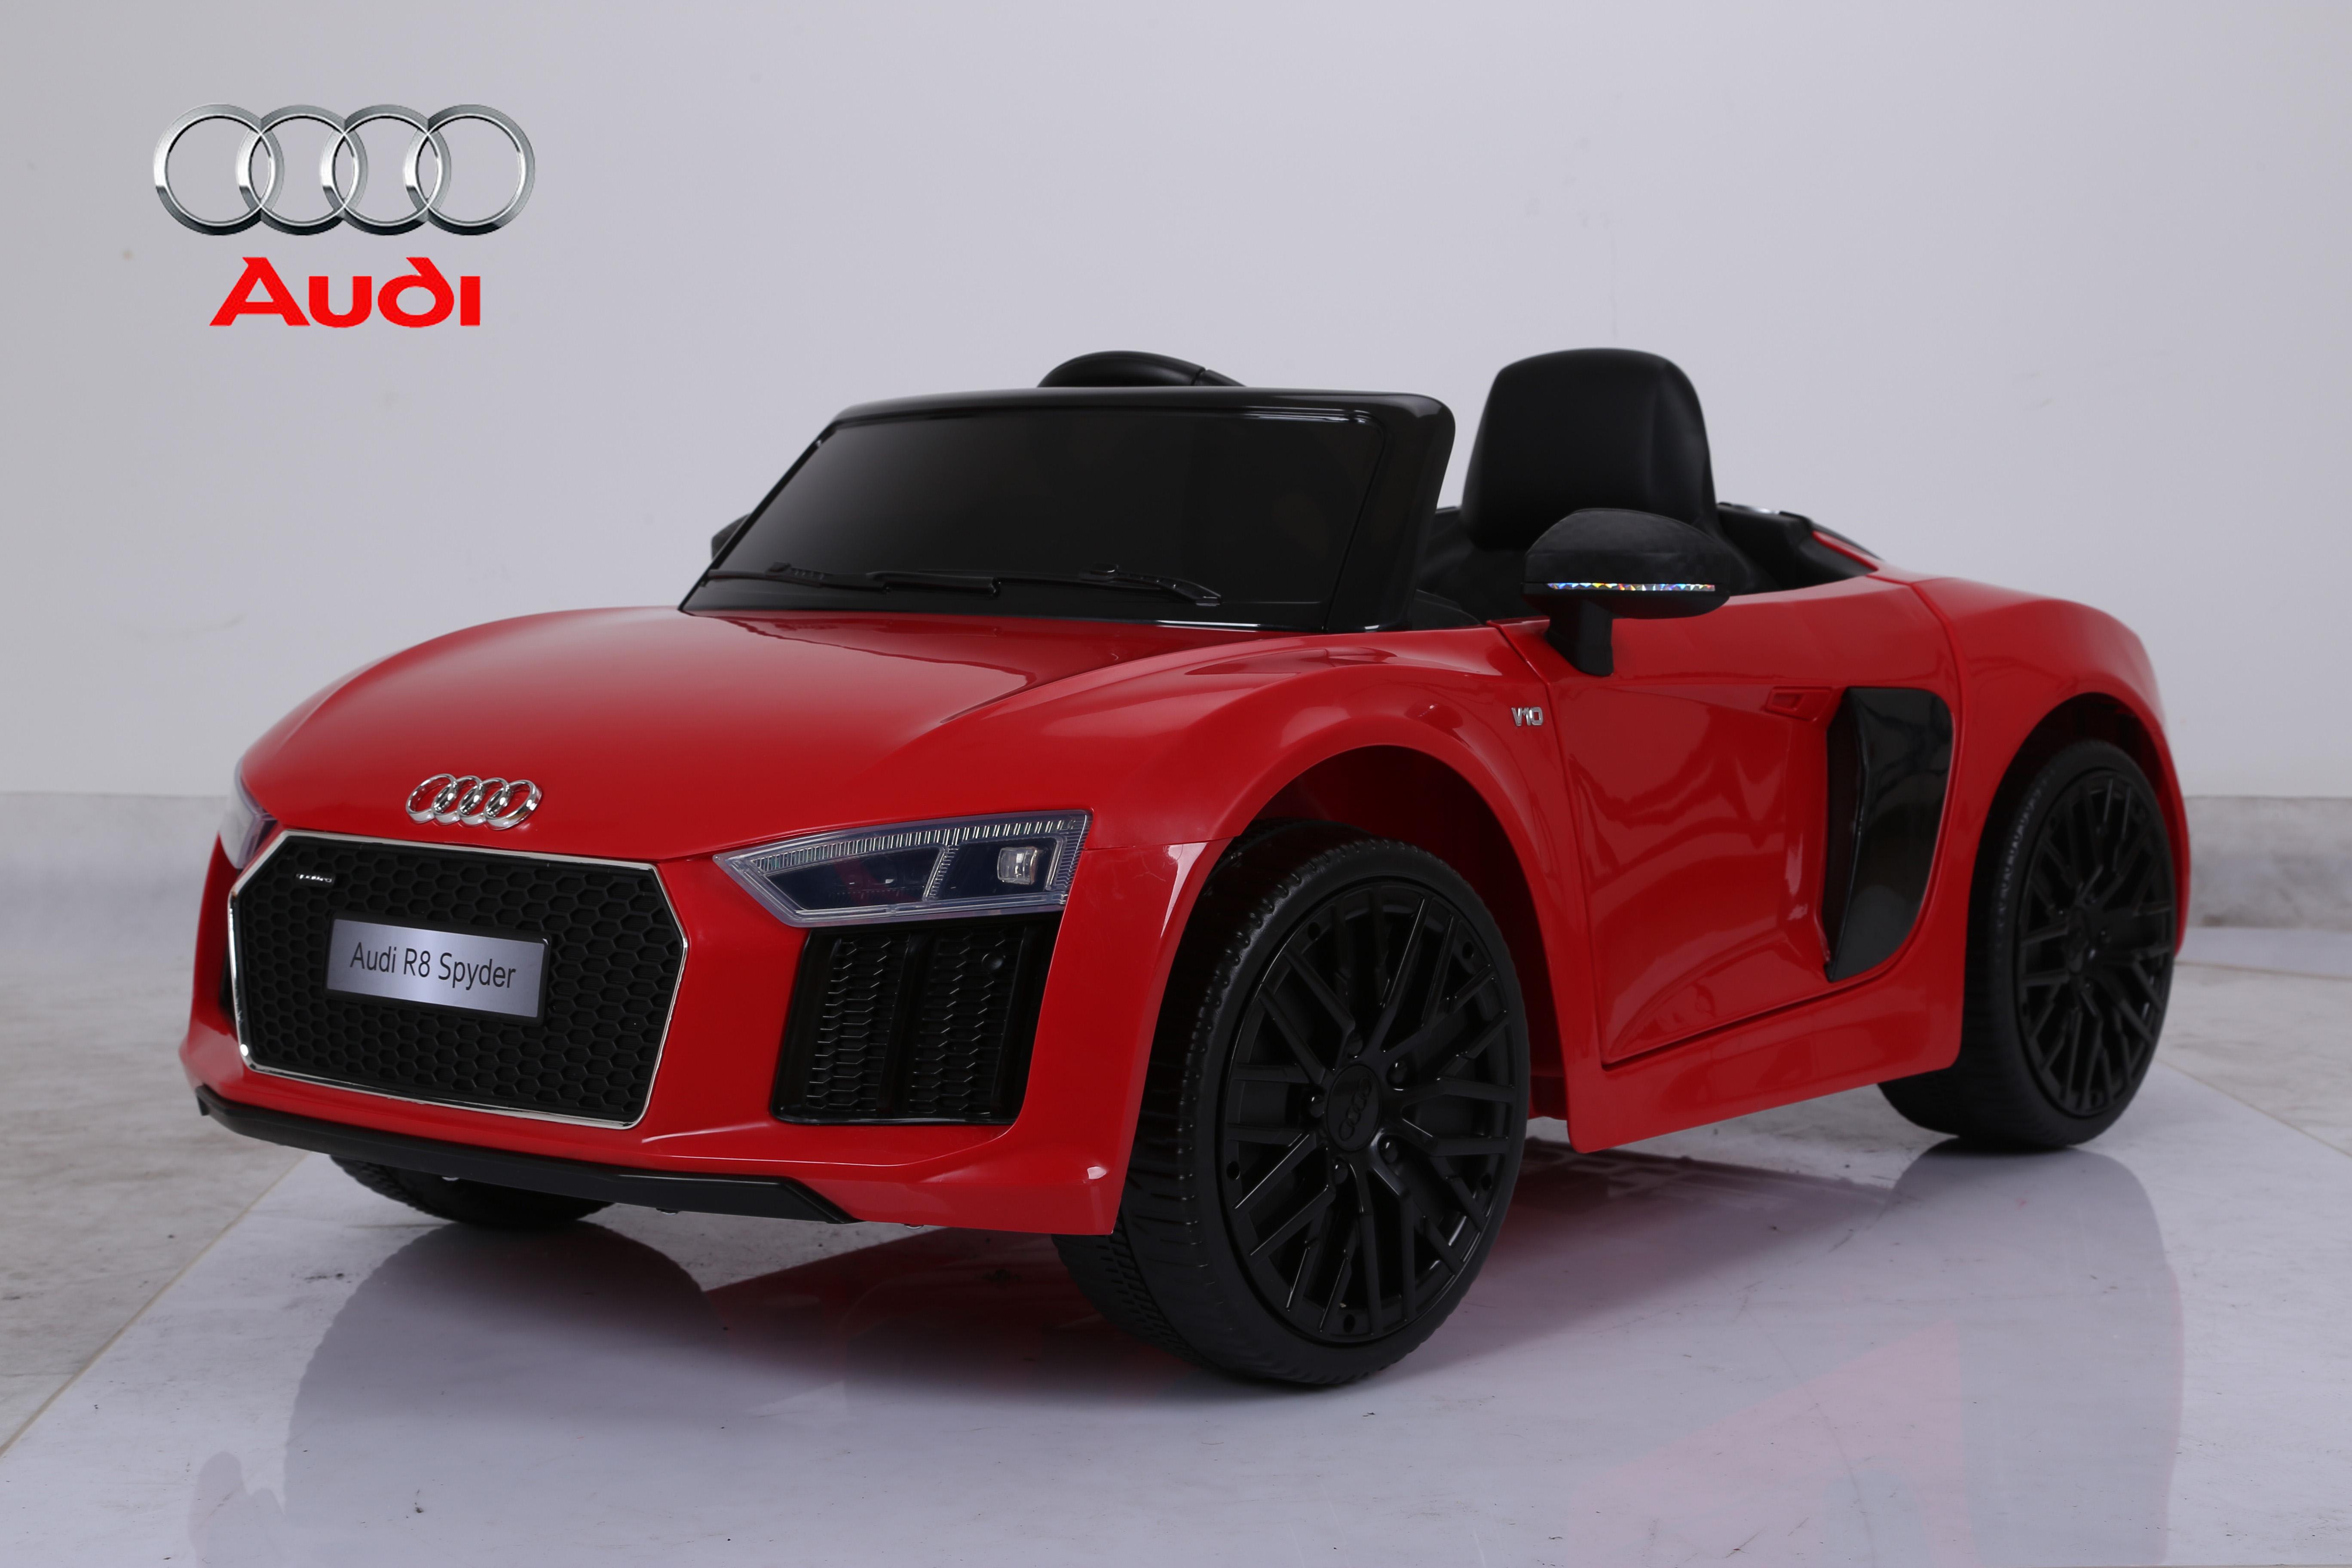 Audi R Licensed Kids Ride On Car V Remote Control Cars Red - Red audi r8